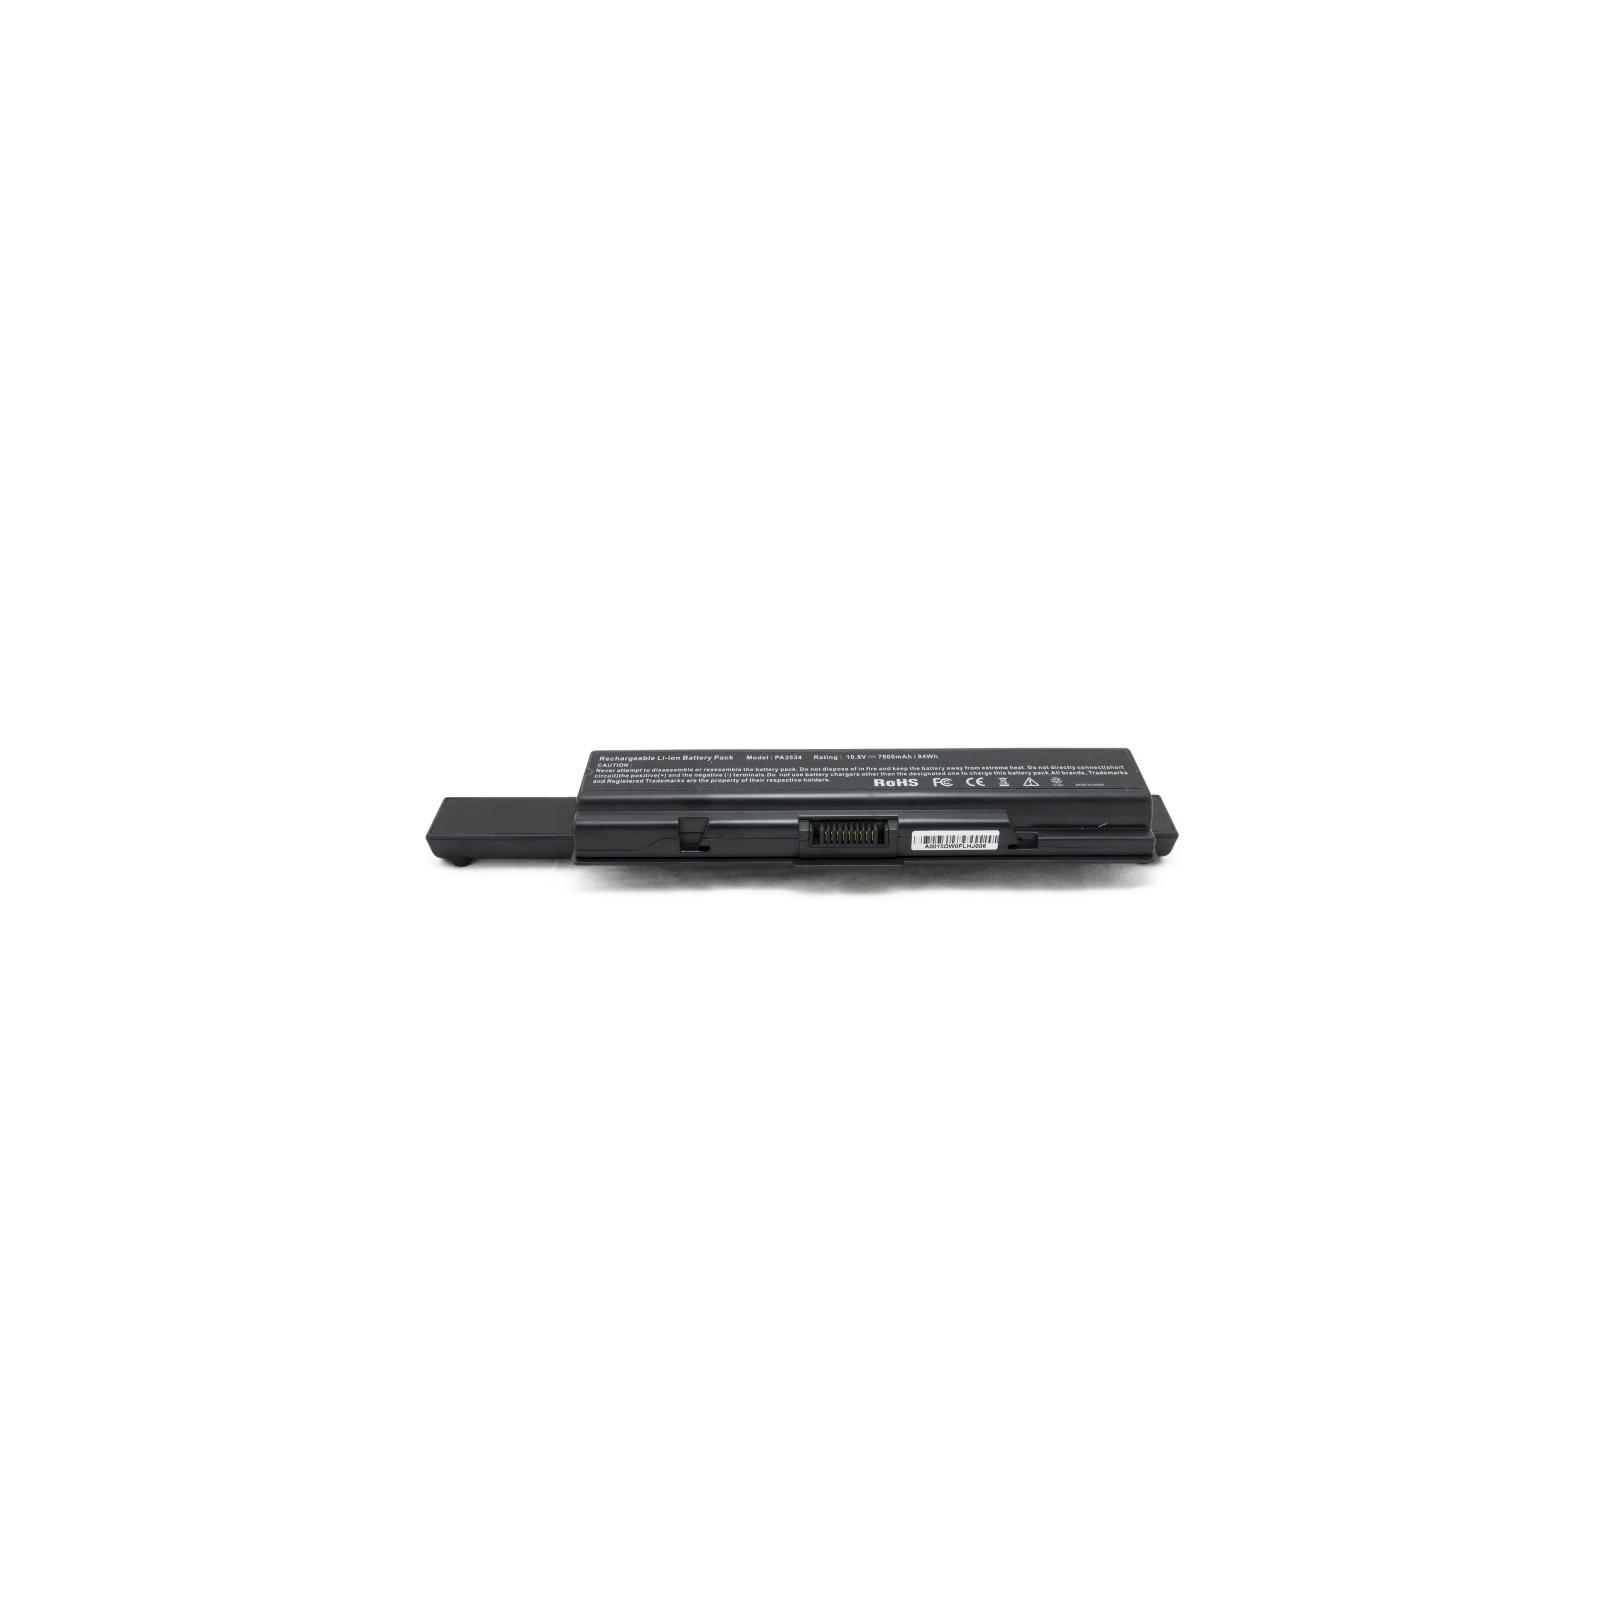 Аккумулятор для ноутбука Toshiba Satellite L500 (PA3534U) 7800 mAh EXTRADIGITAL (BNT3960) изображение 4